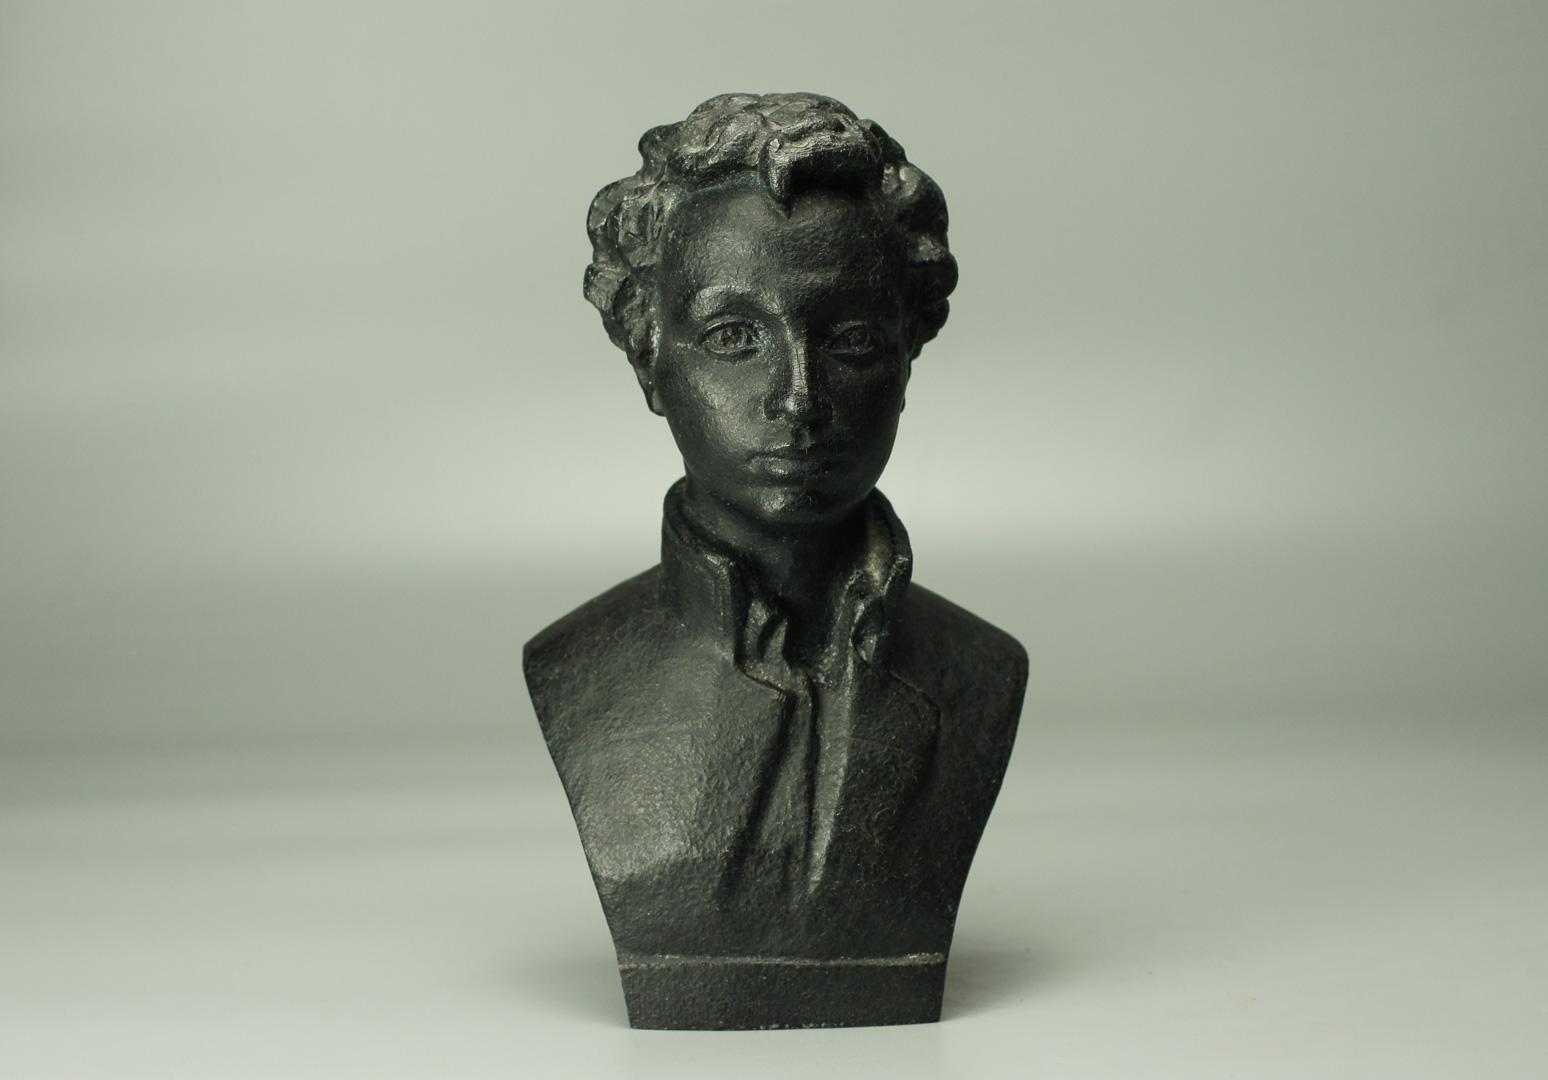 Бюст Пушкин лицеист металл